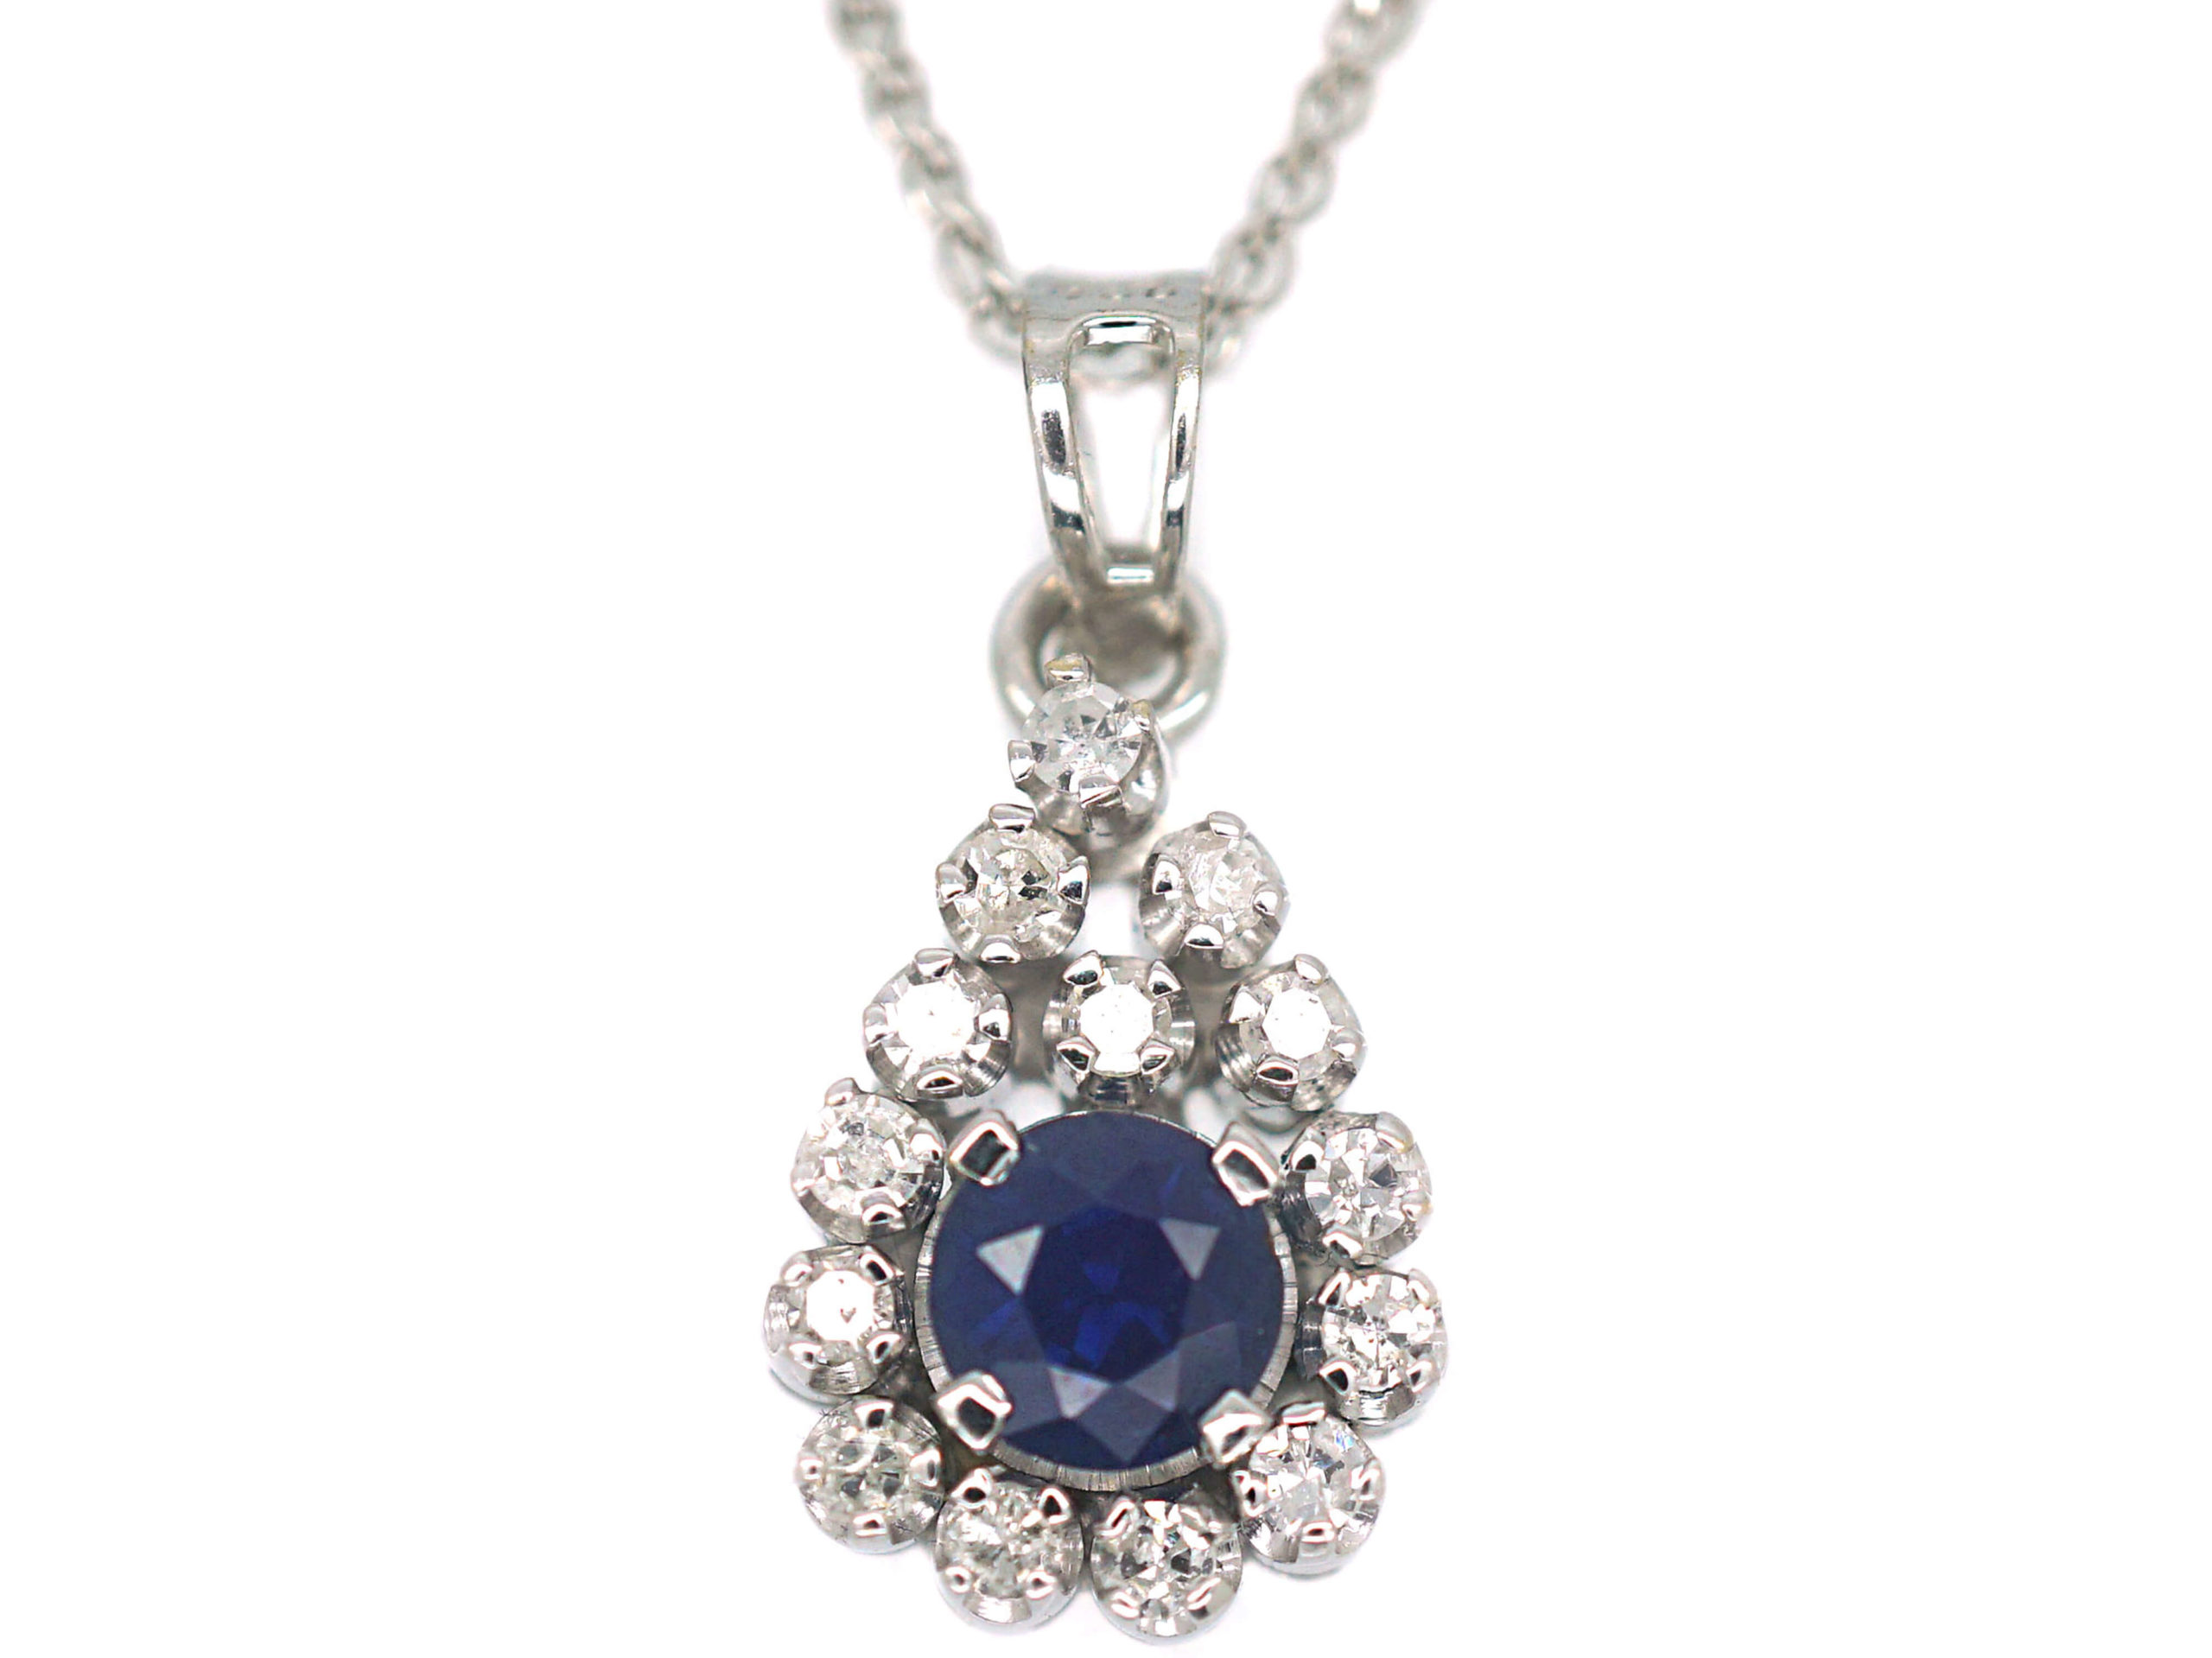 18ct White Gold, Sapphire & Diamond Pendant on 14ct White Gold Chain